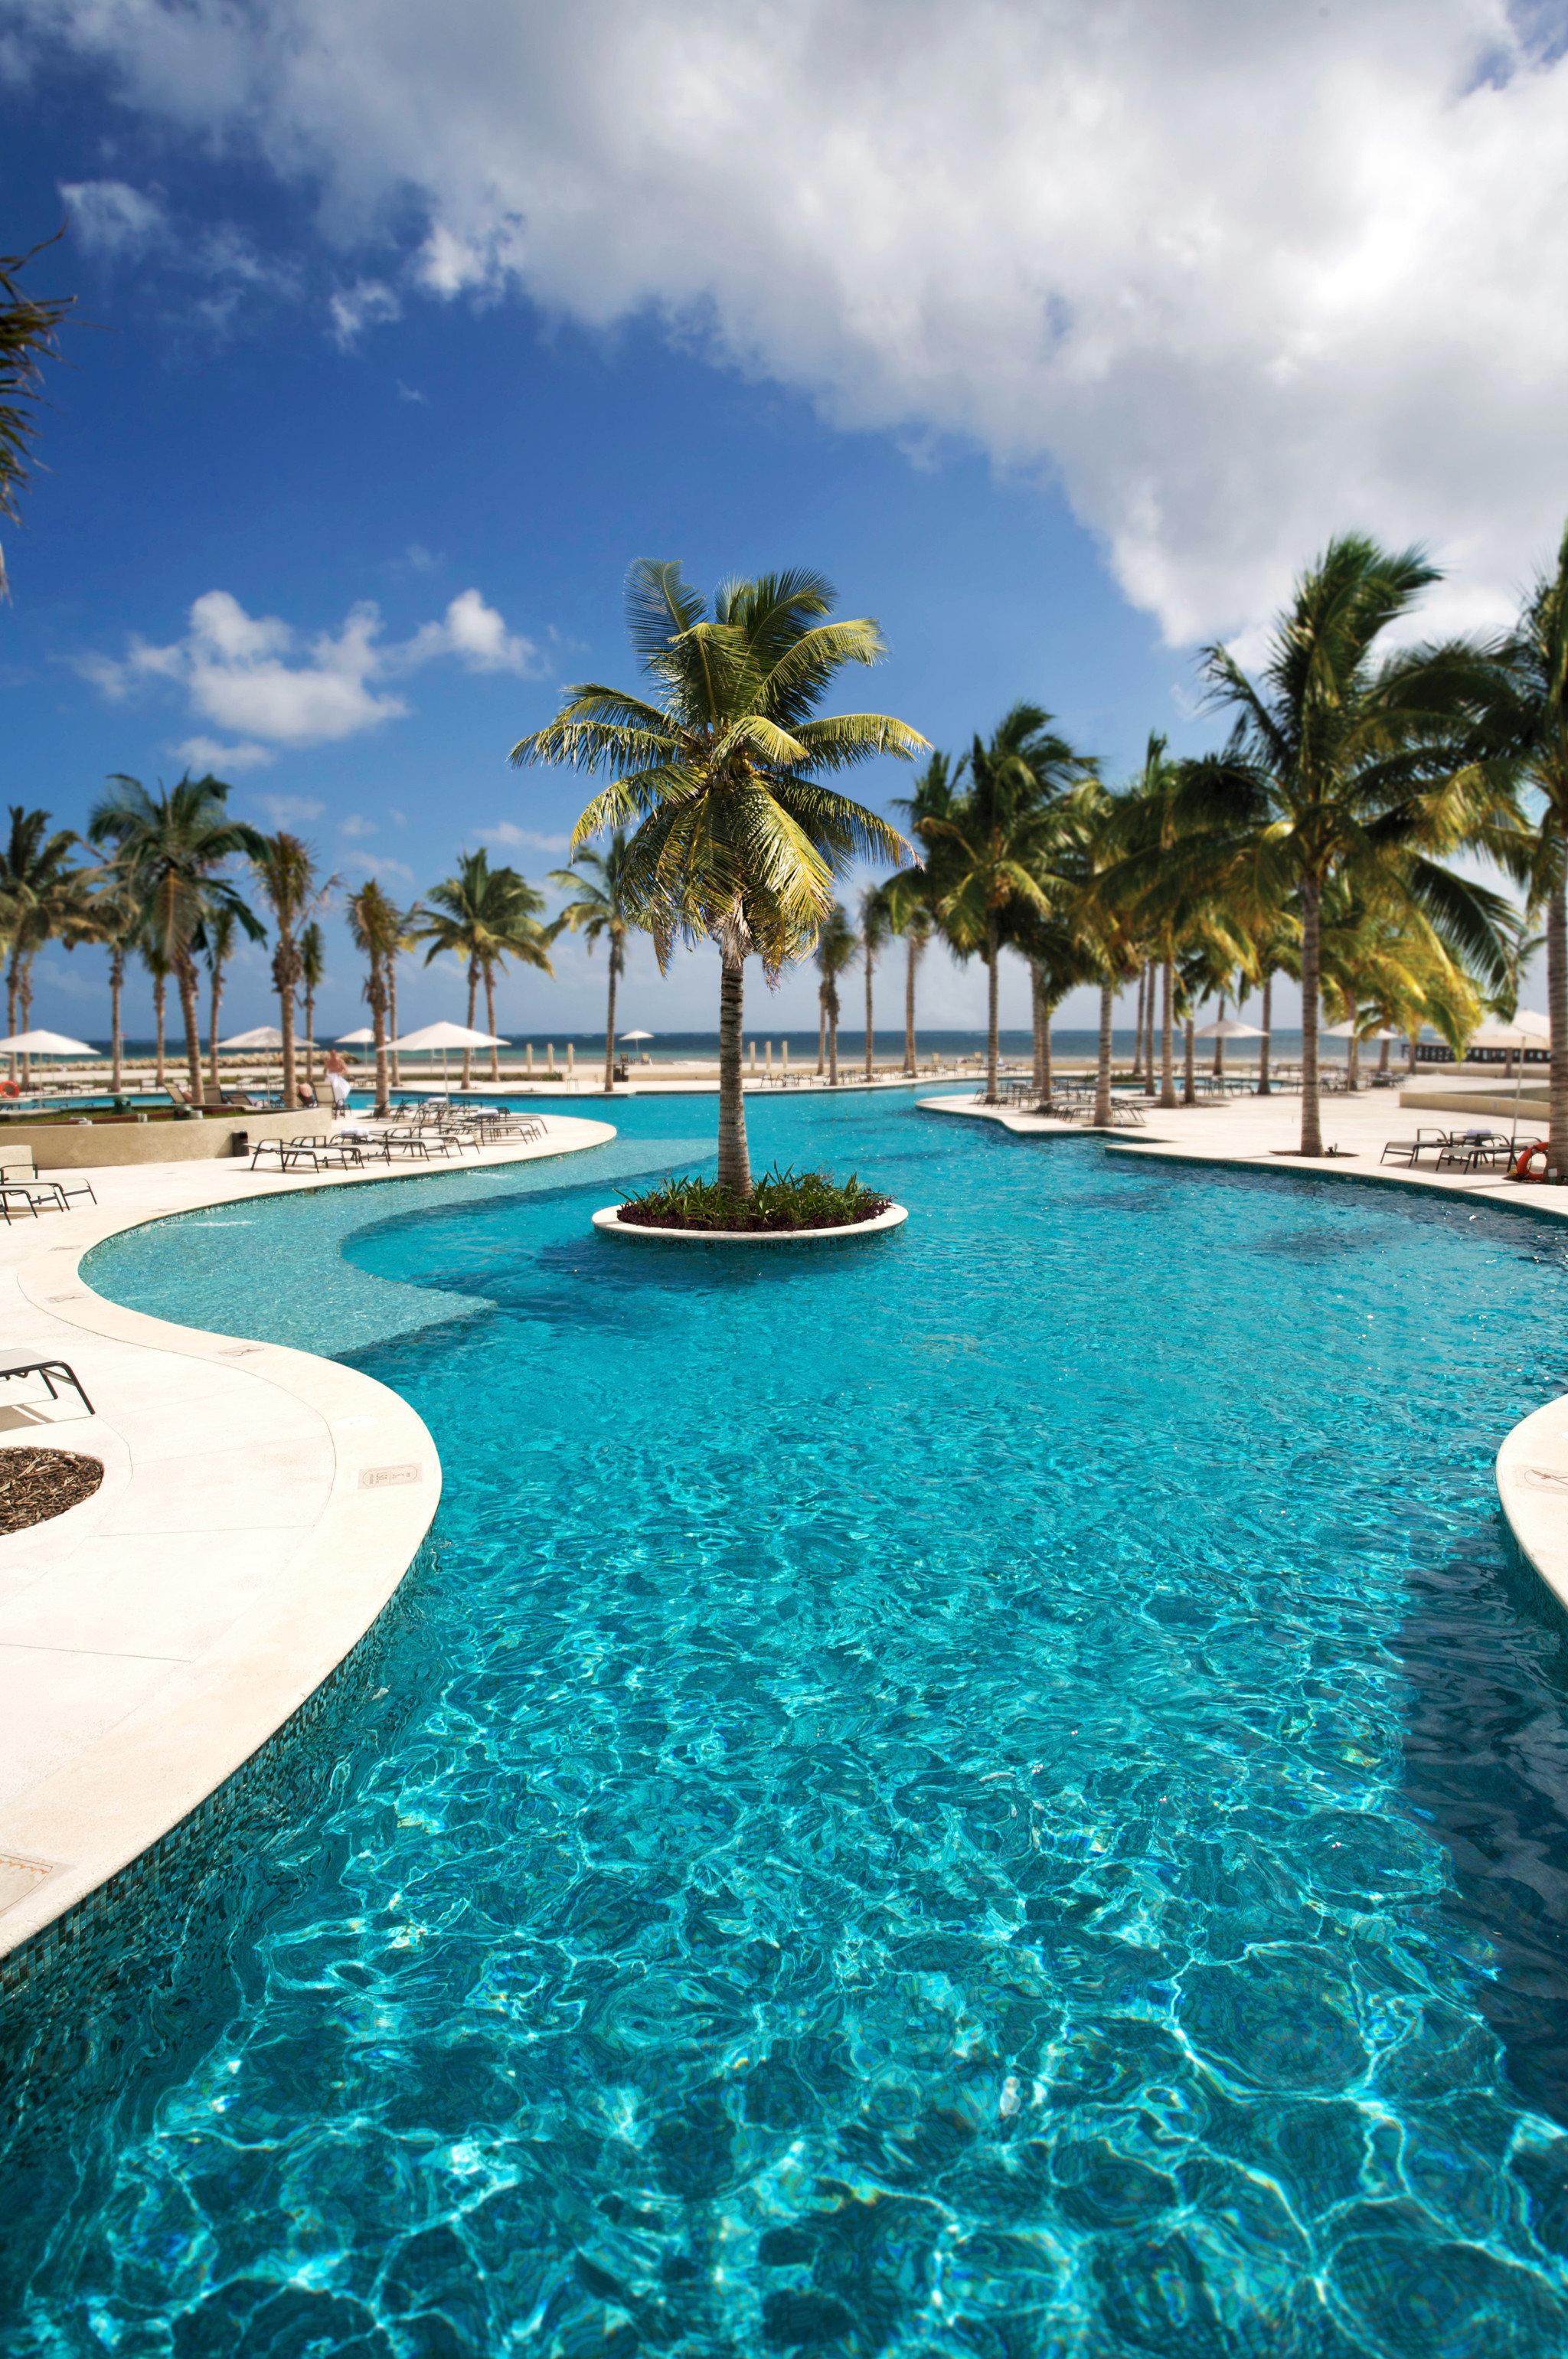 Beachfront Lounge Luxury Modern Pool sky water umbrella swimming pool Resort leisure caribbean Sea Lagoon swimming Ocean resort town reef Beach lawn blue tropics arecales sunny day shore